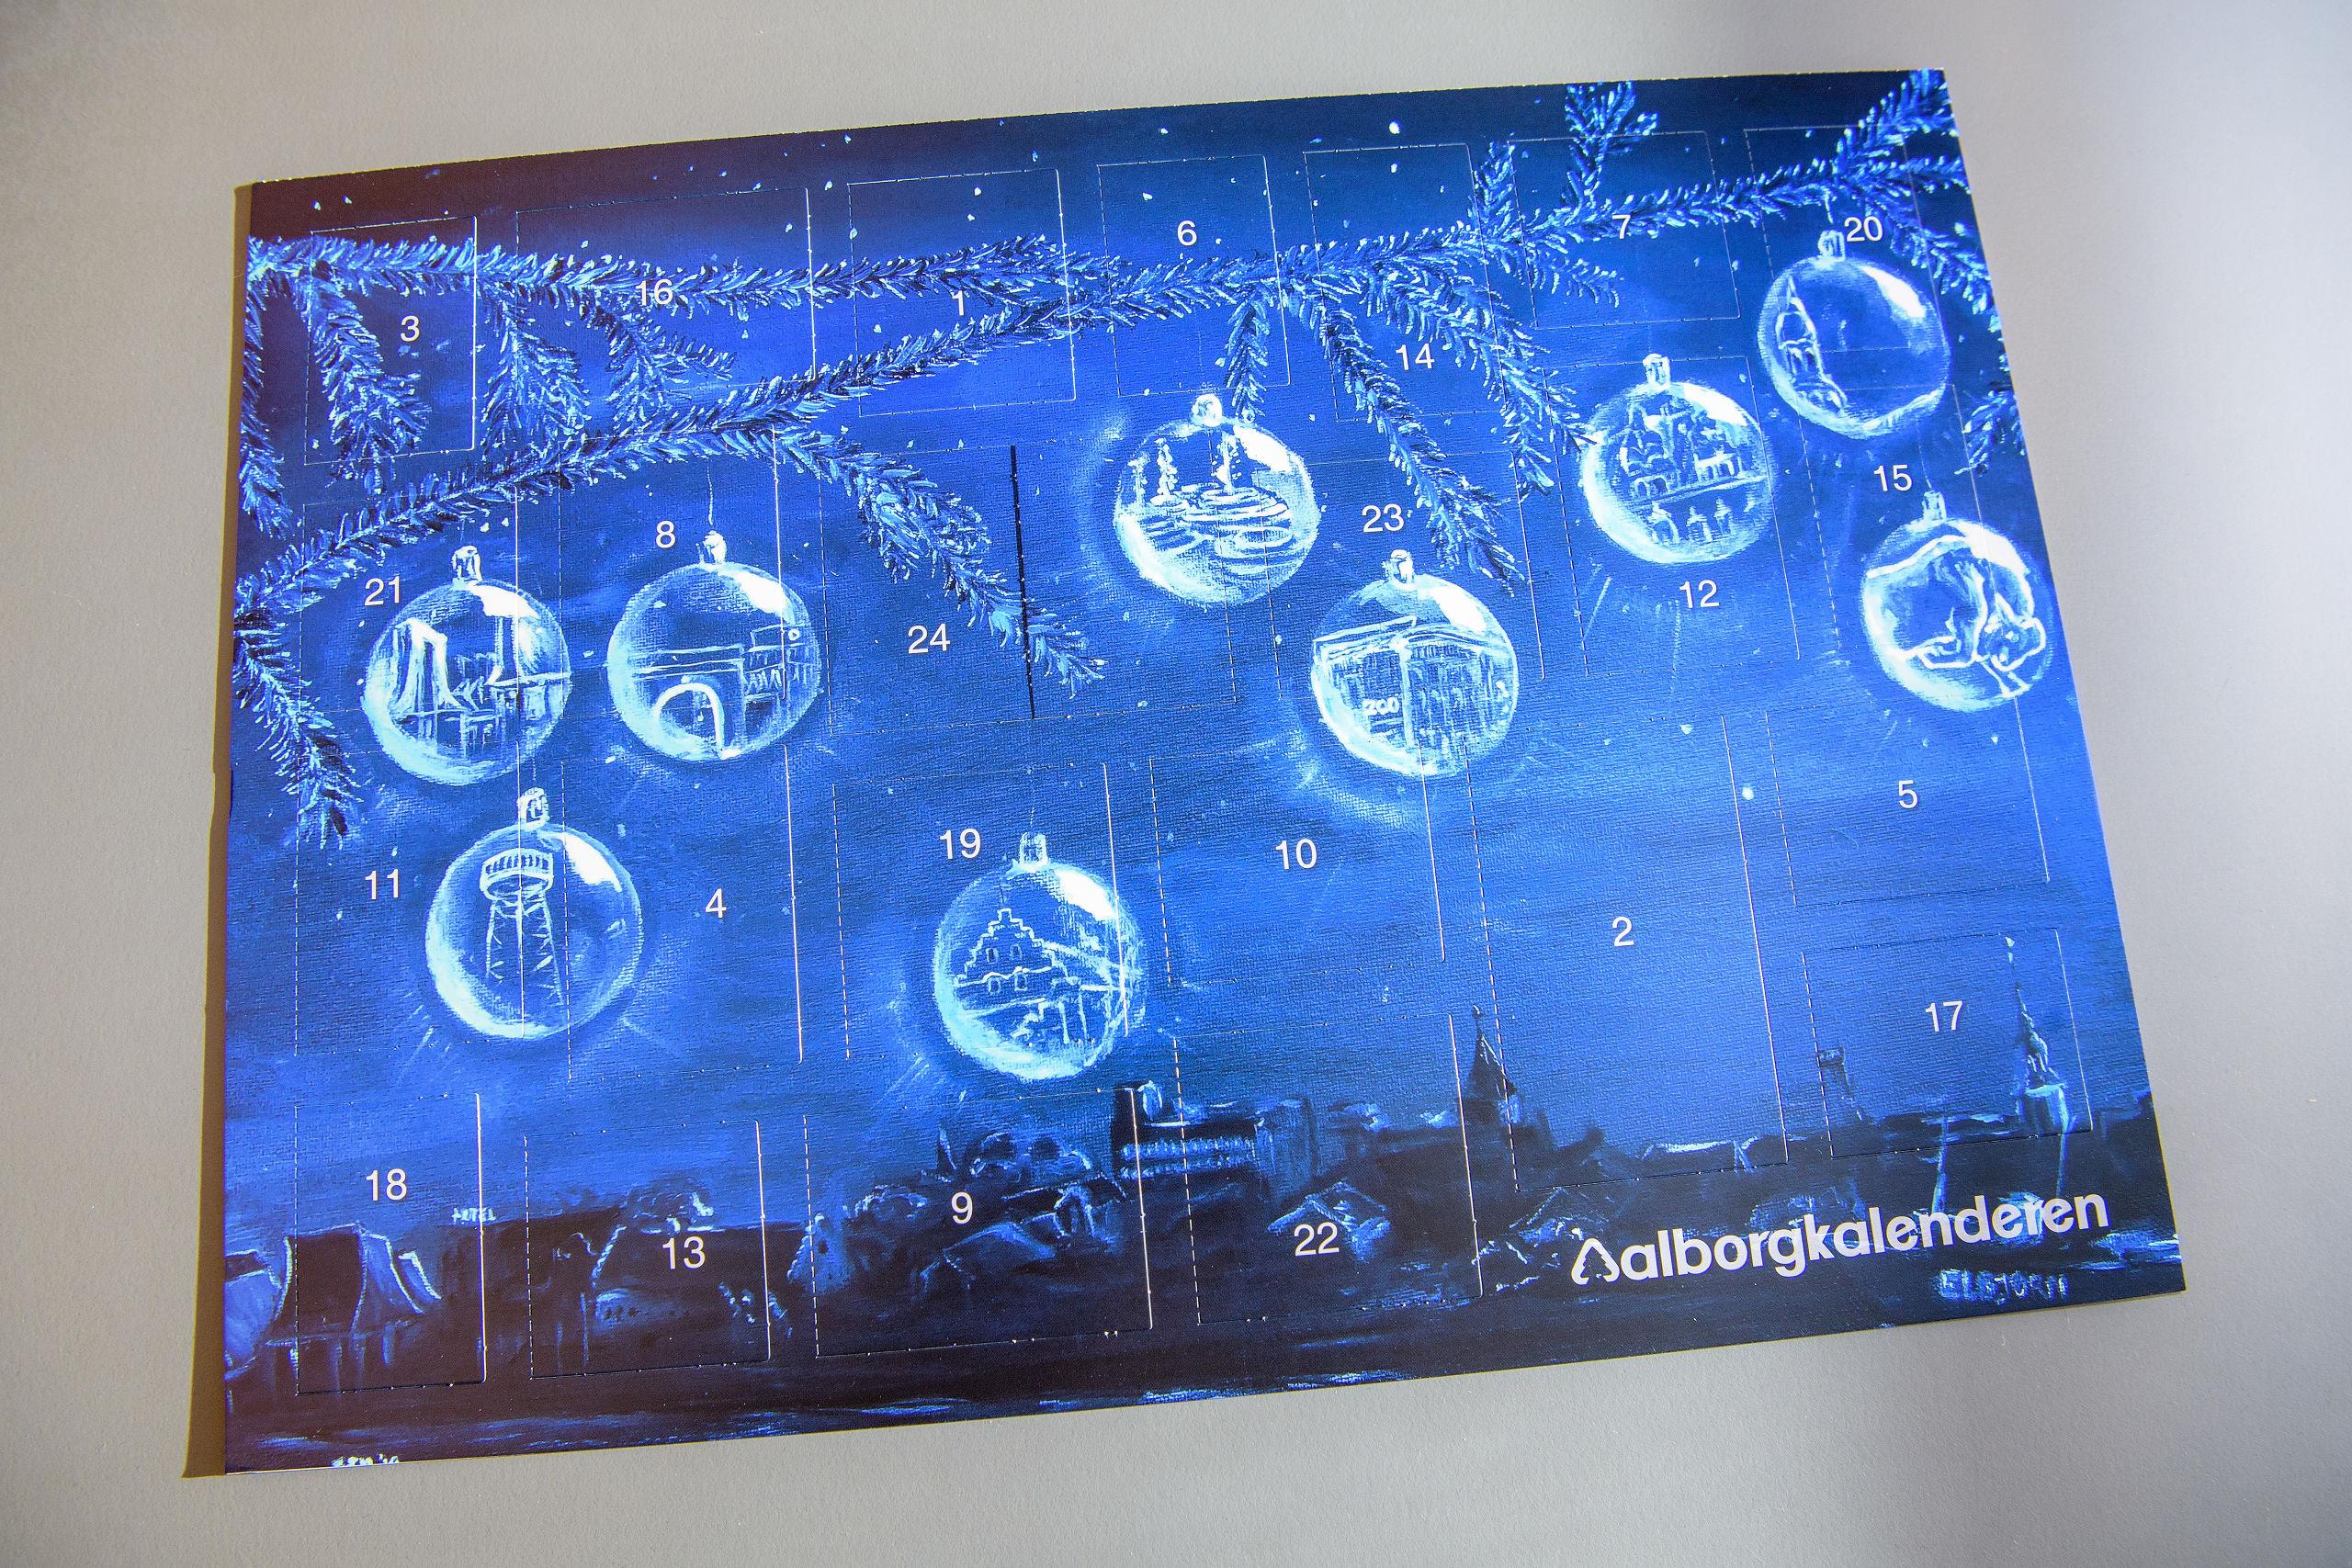 Ny julekalender: Støtter børn indlagt på hospitalet